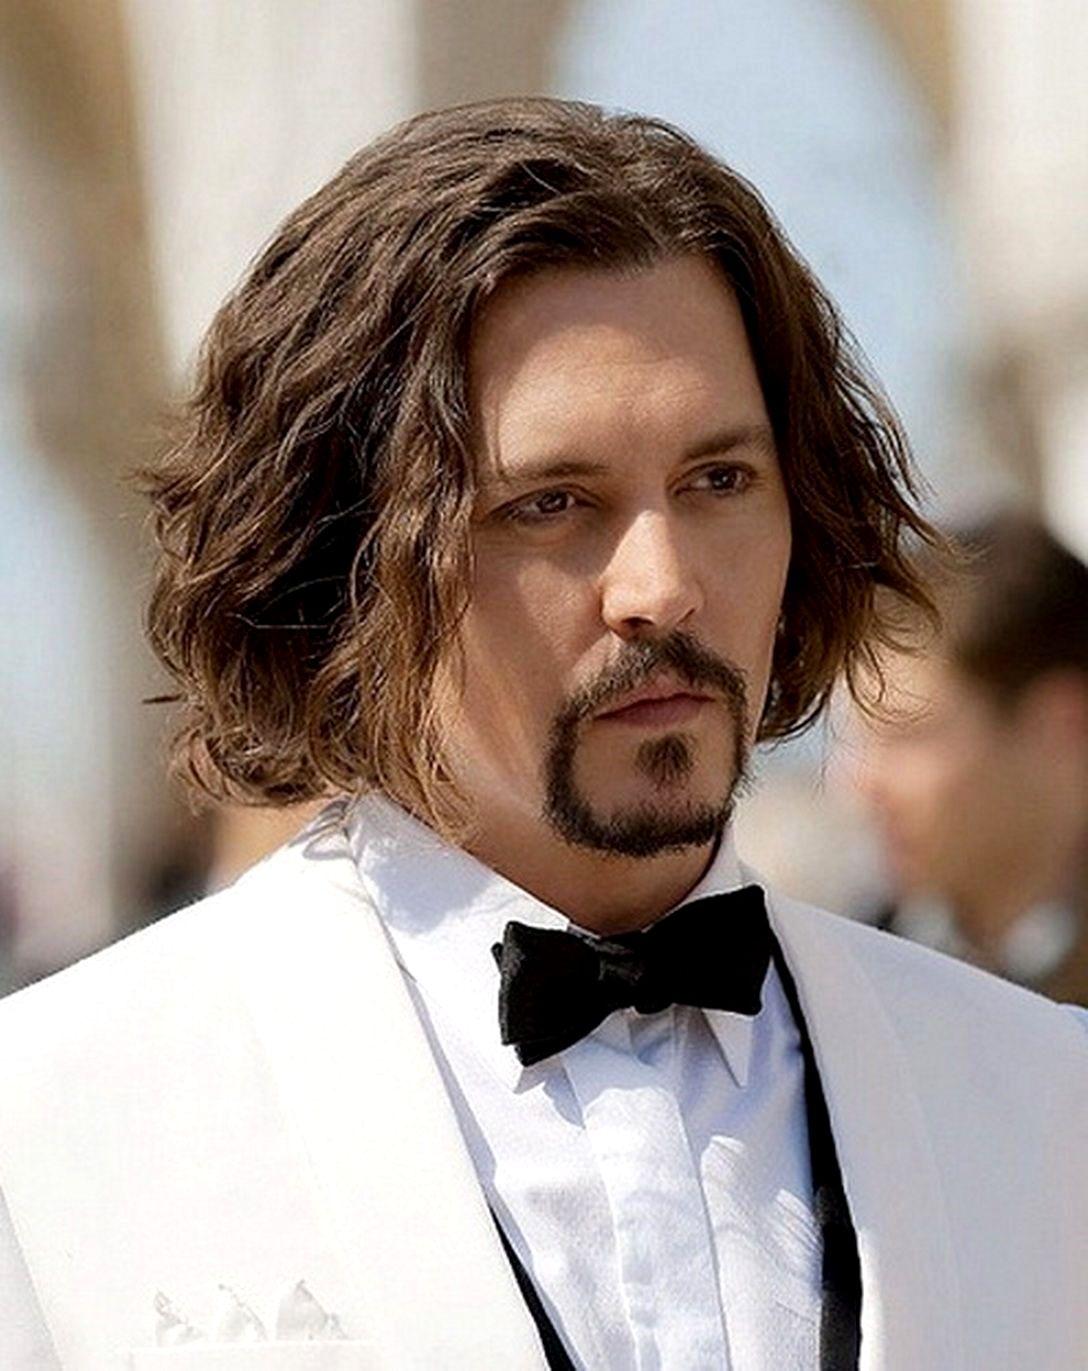 Mens Hairstyles Long Beautiful In 2020 Long Hair Styles Men Mid Length Hair Medium Hair Styles